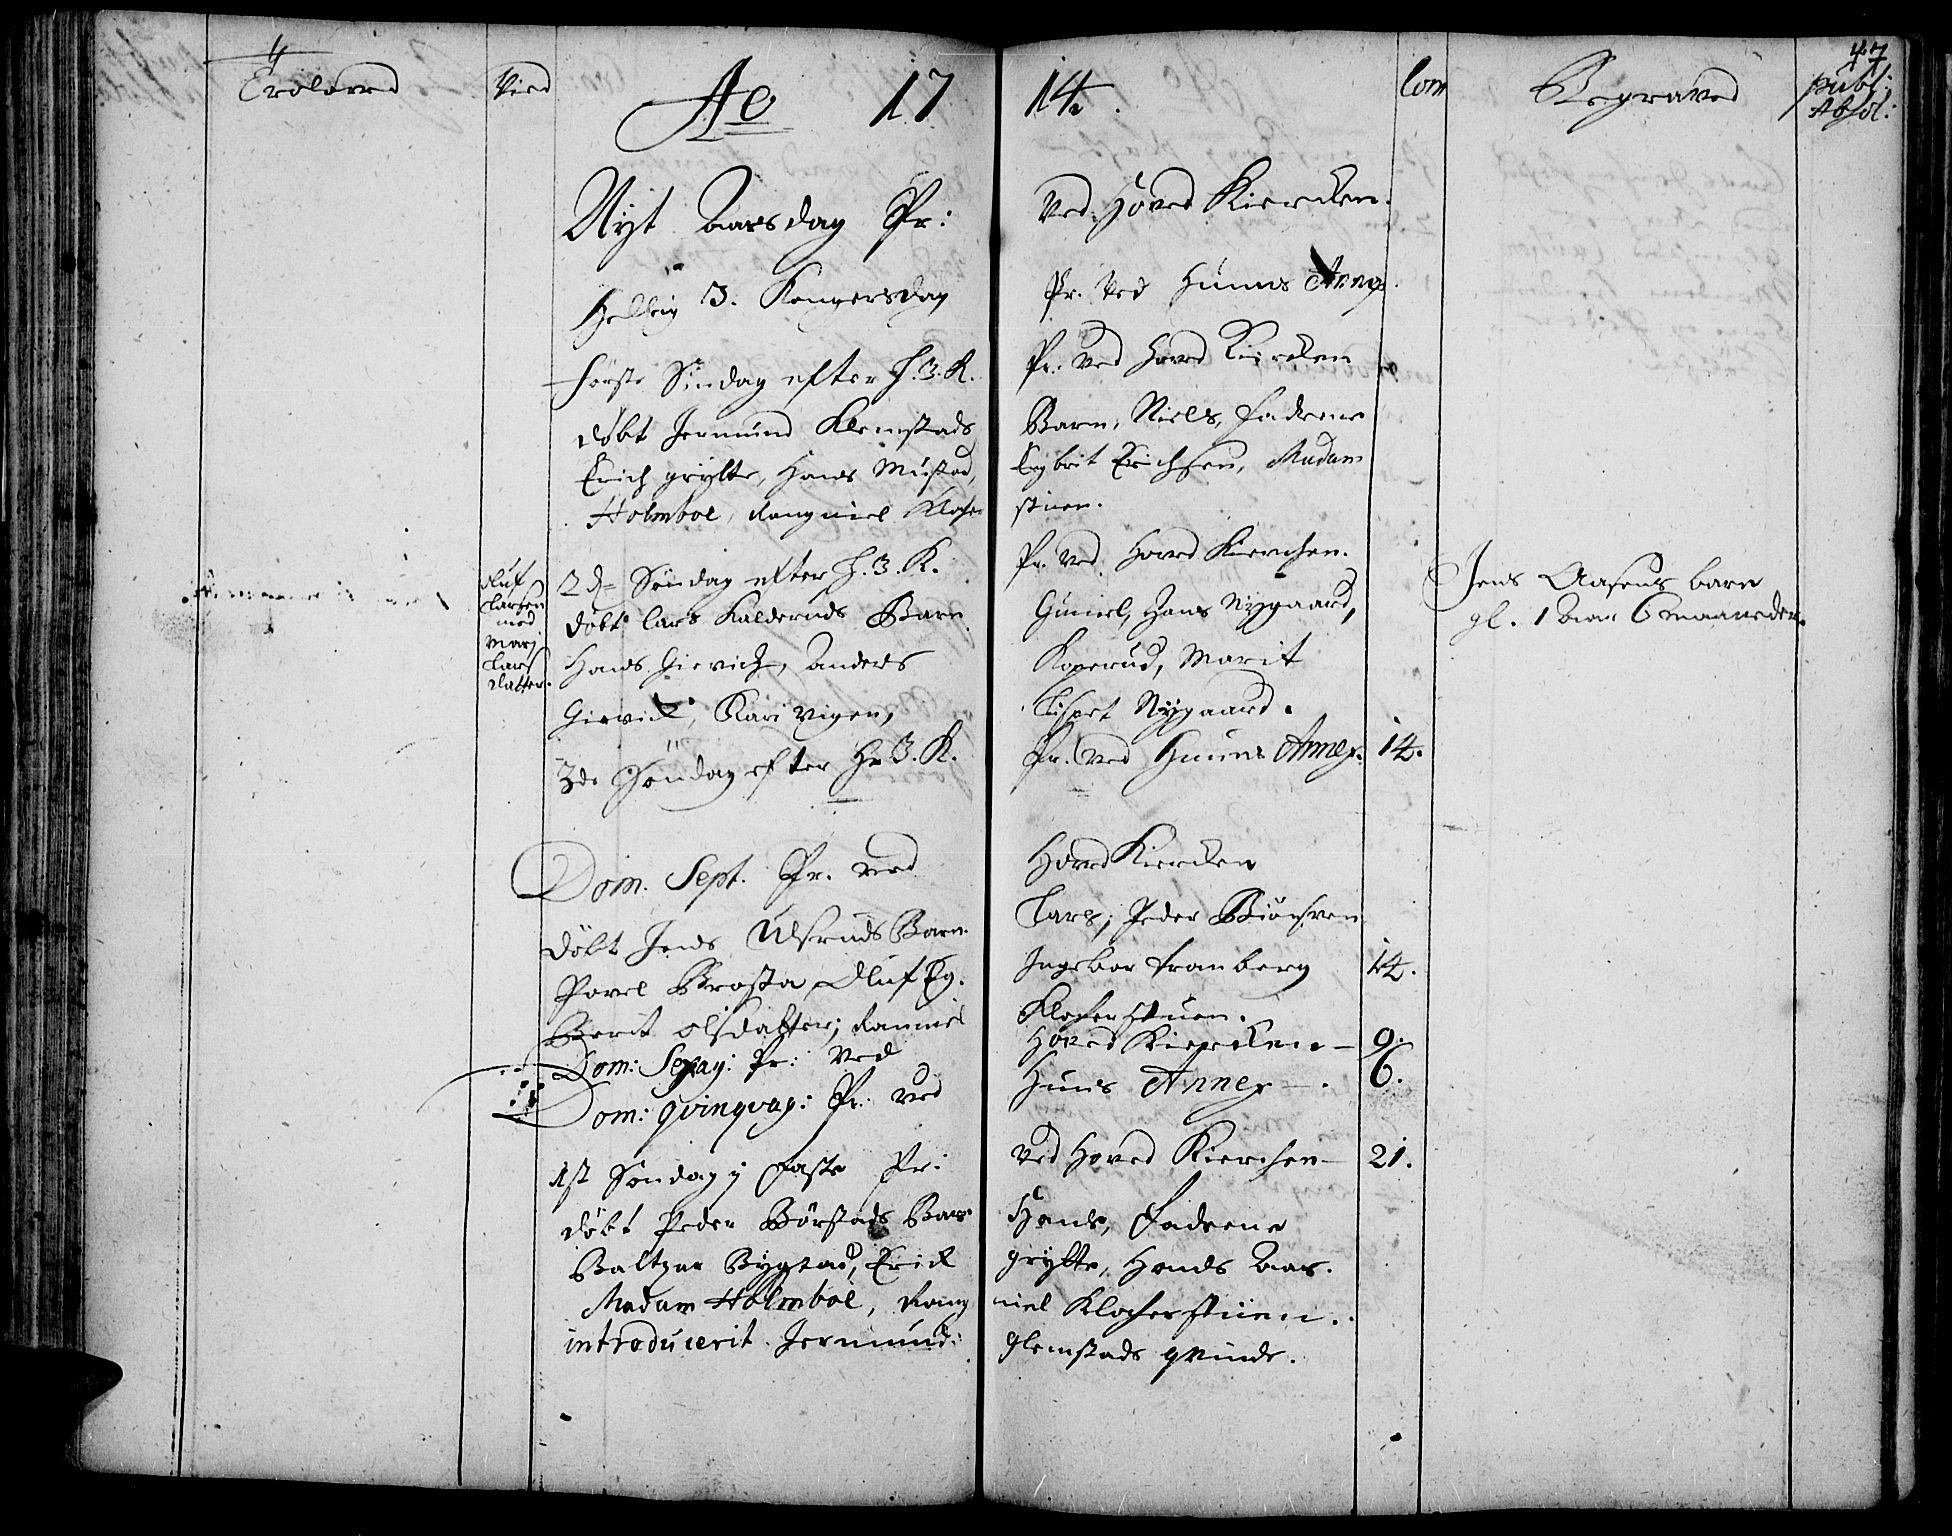 SAH, Vardal prestekontor, H/Ha/Haa/L0001: Ministerialbok nr. 1, 1706-1748, s. 47